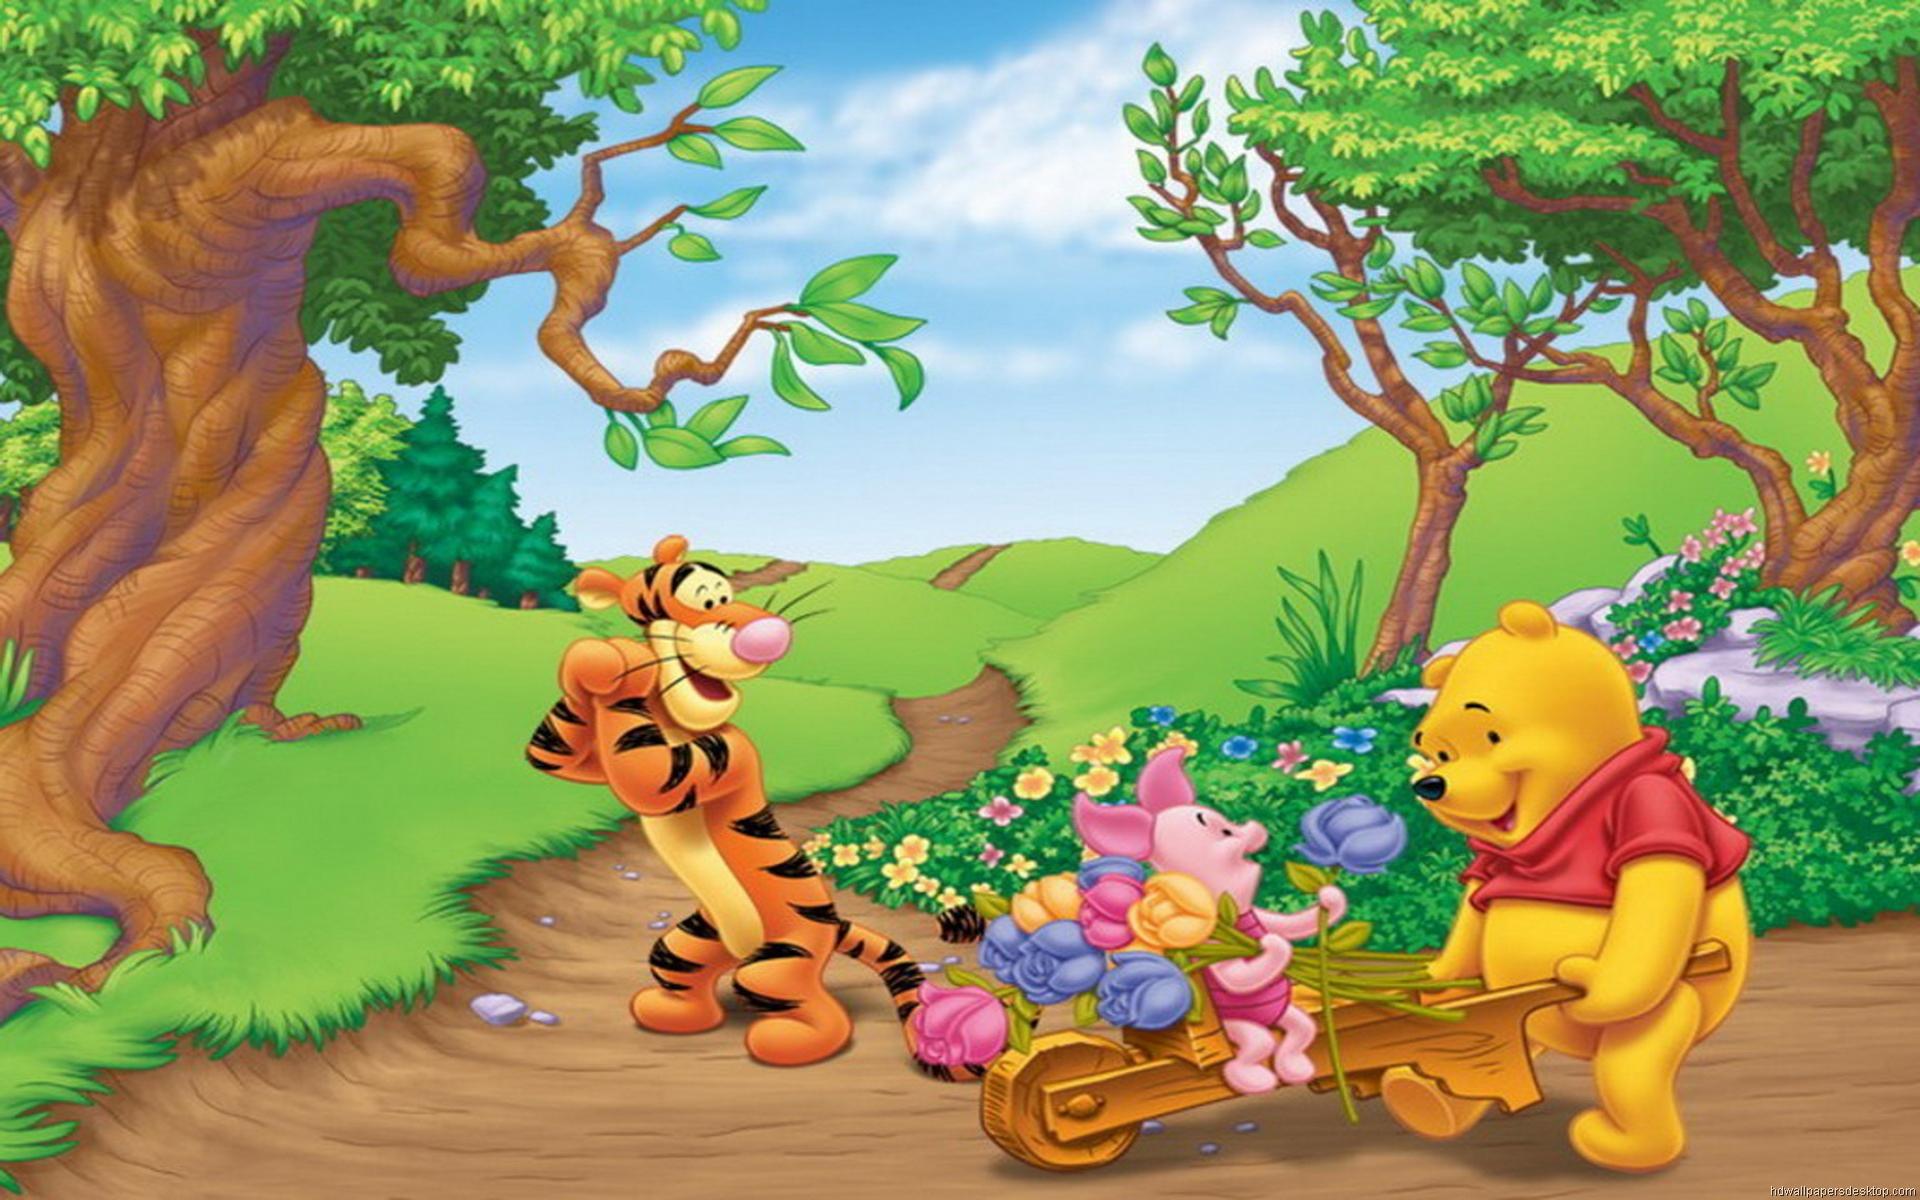 Winnie the Pooh Computer Wallpaper 1920x1200